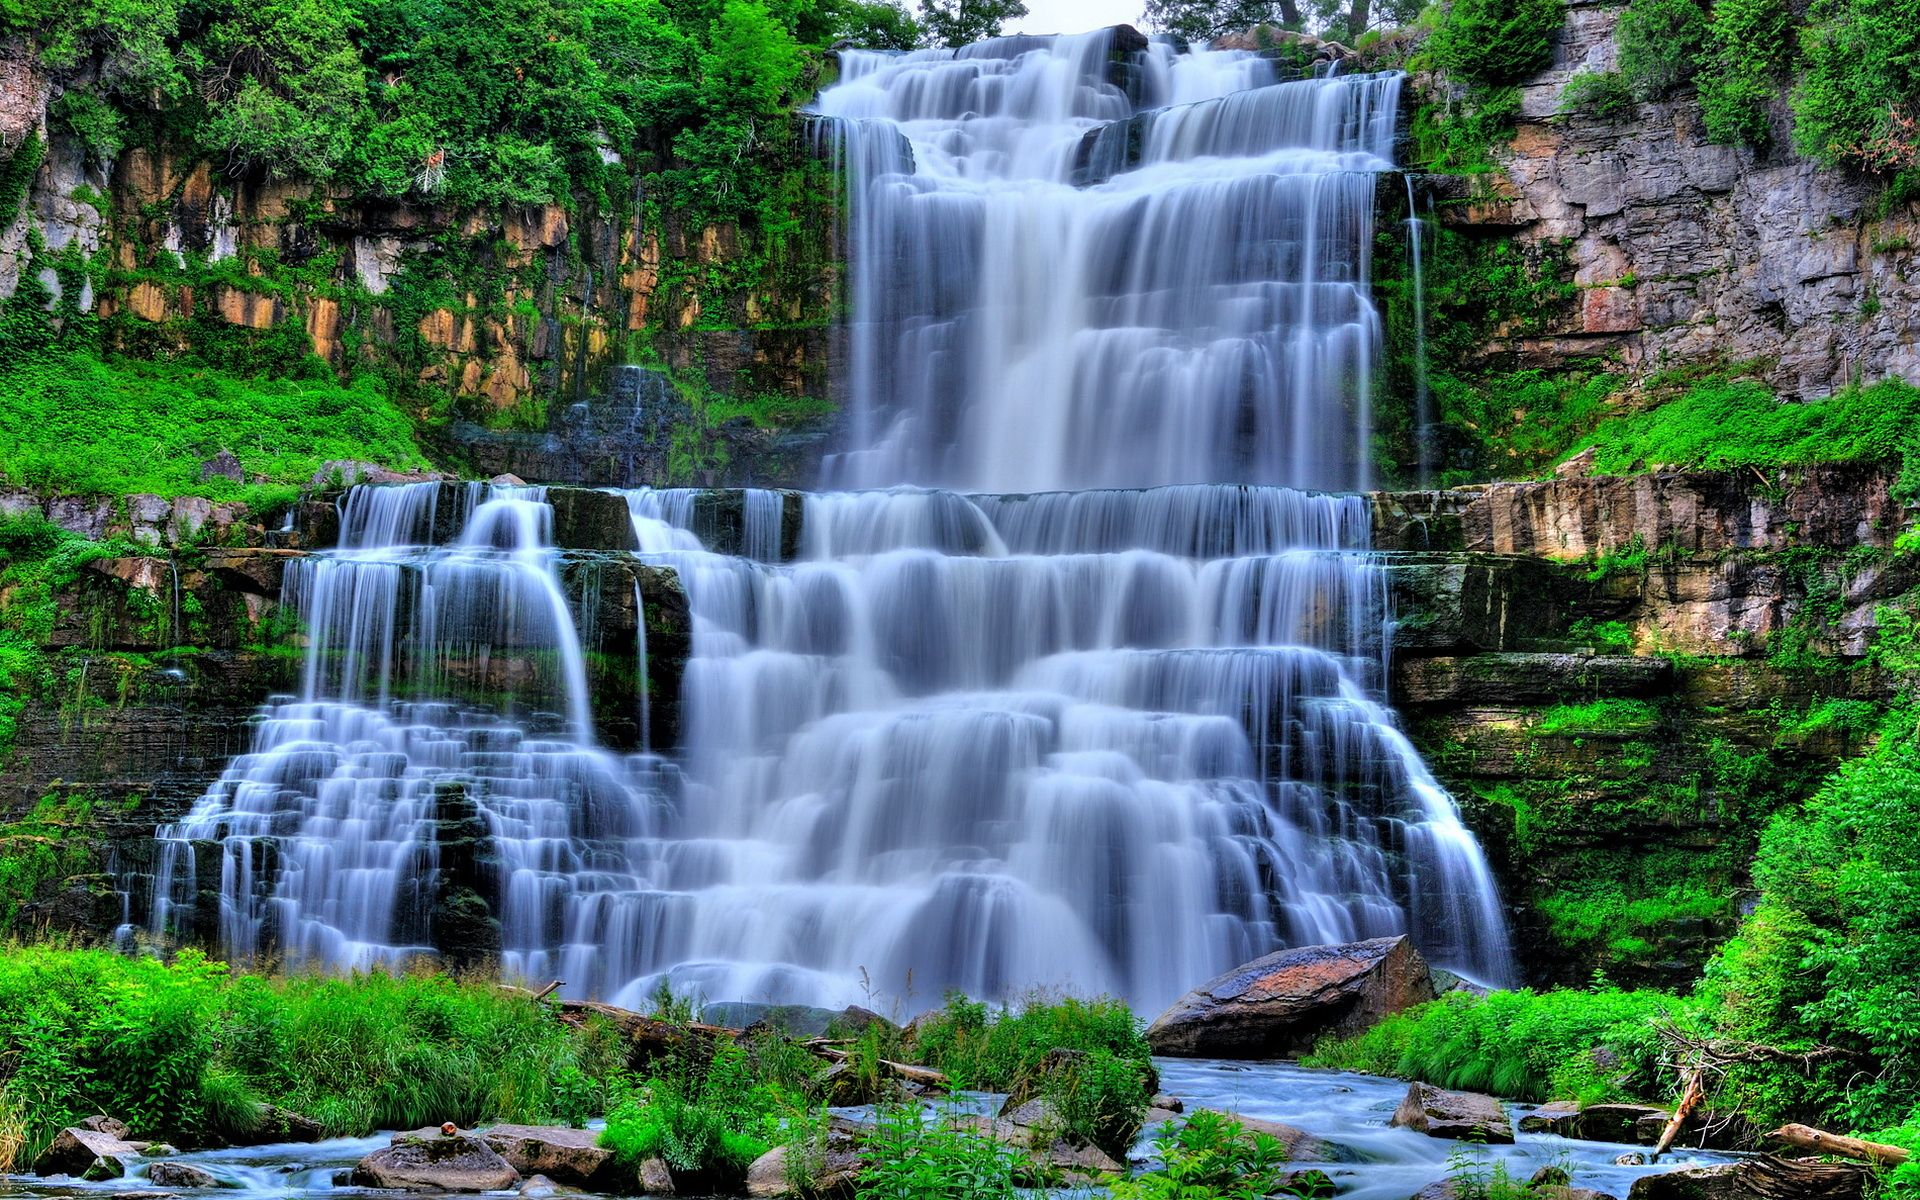 Pin By Brianna Olson On Voda Kaskada Slap Water Cascade Waterfall Waterfall Scenery Natural Waterfalls Waterfall Wallpaper